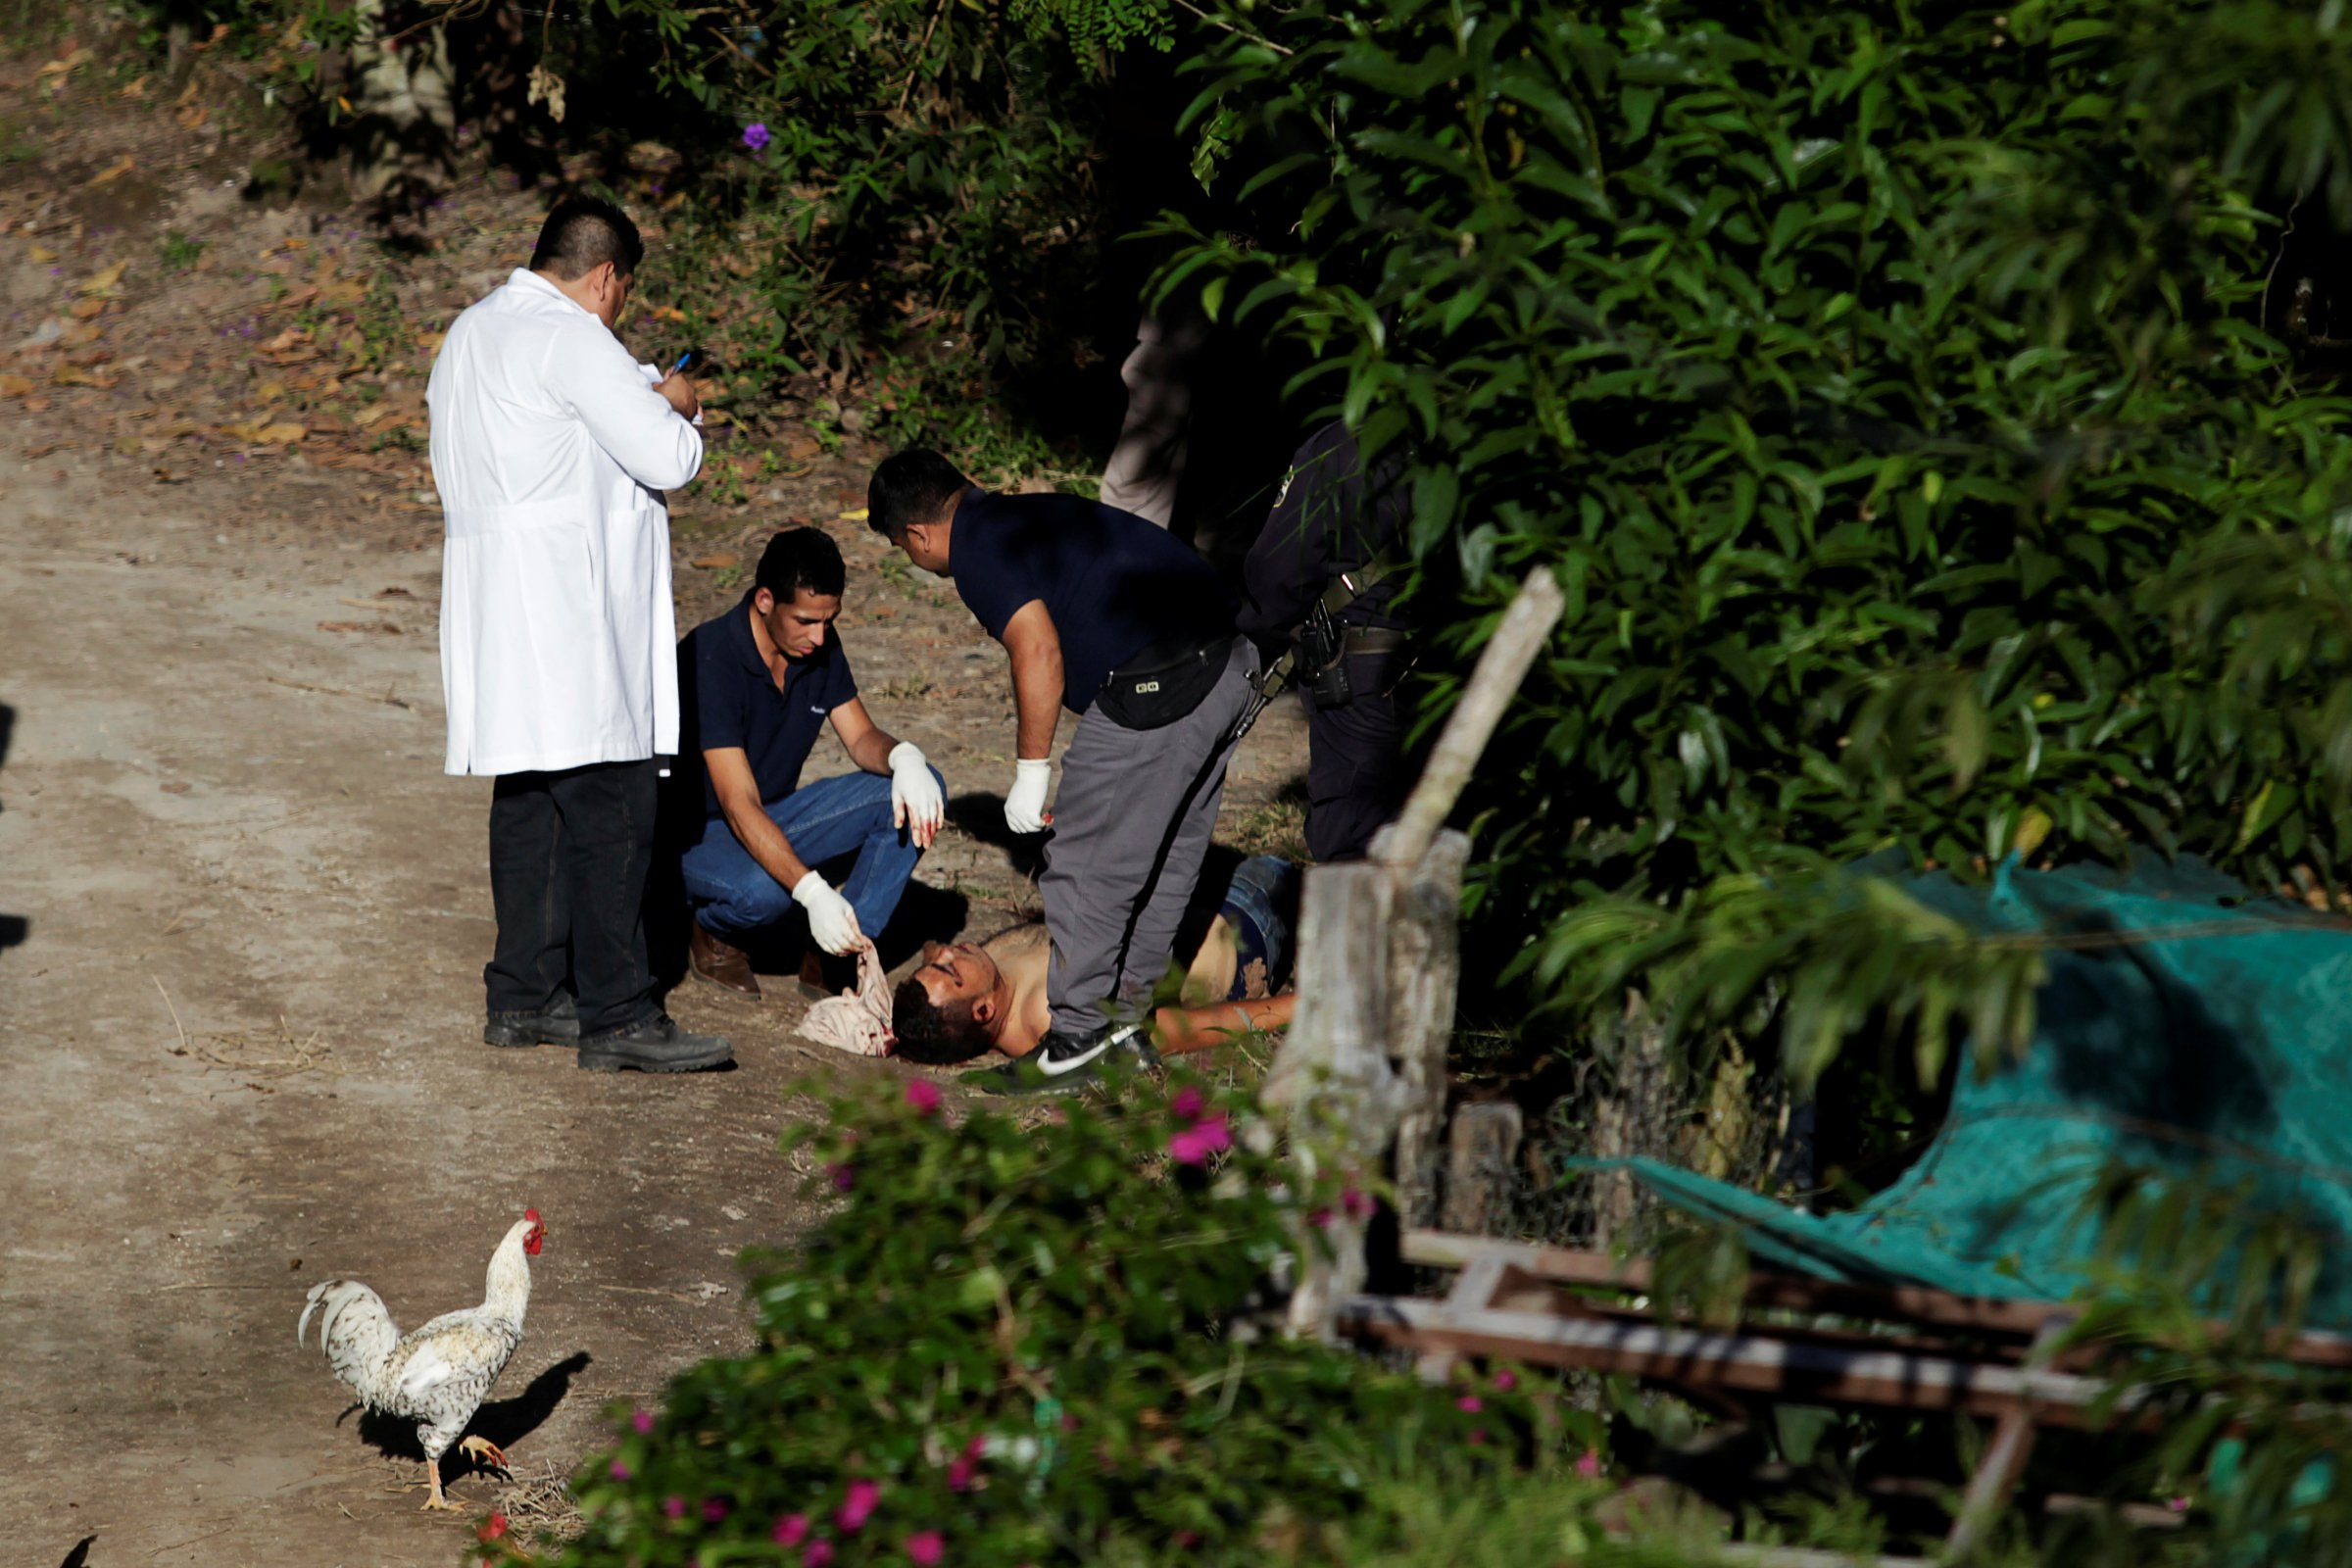 San Salvador El Salvador crime scene murder killing victim police